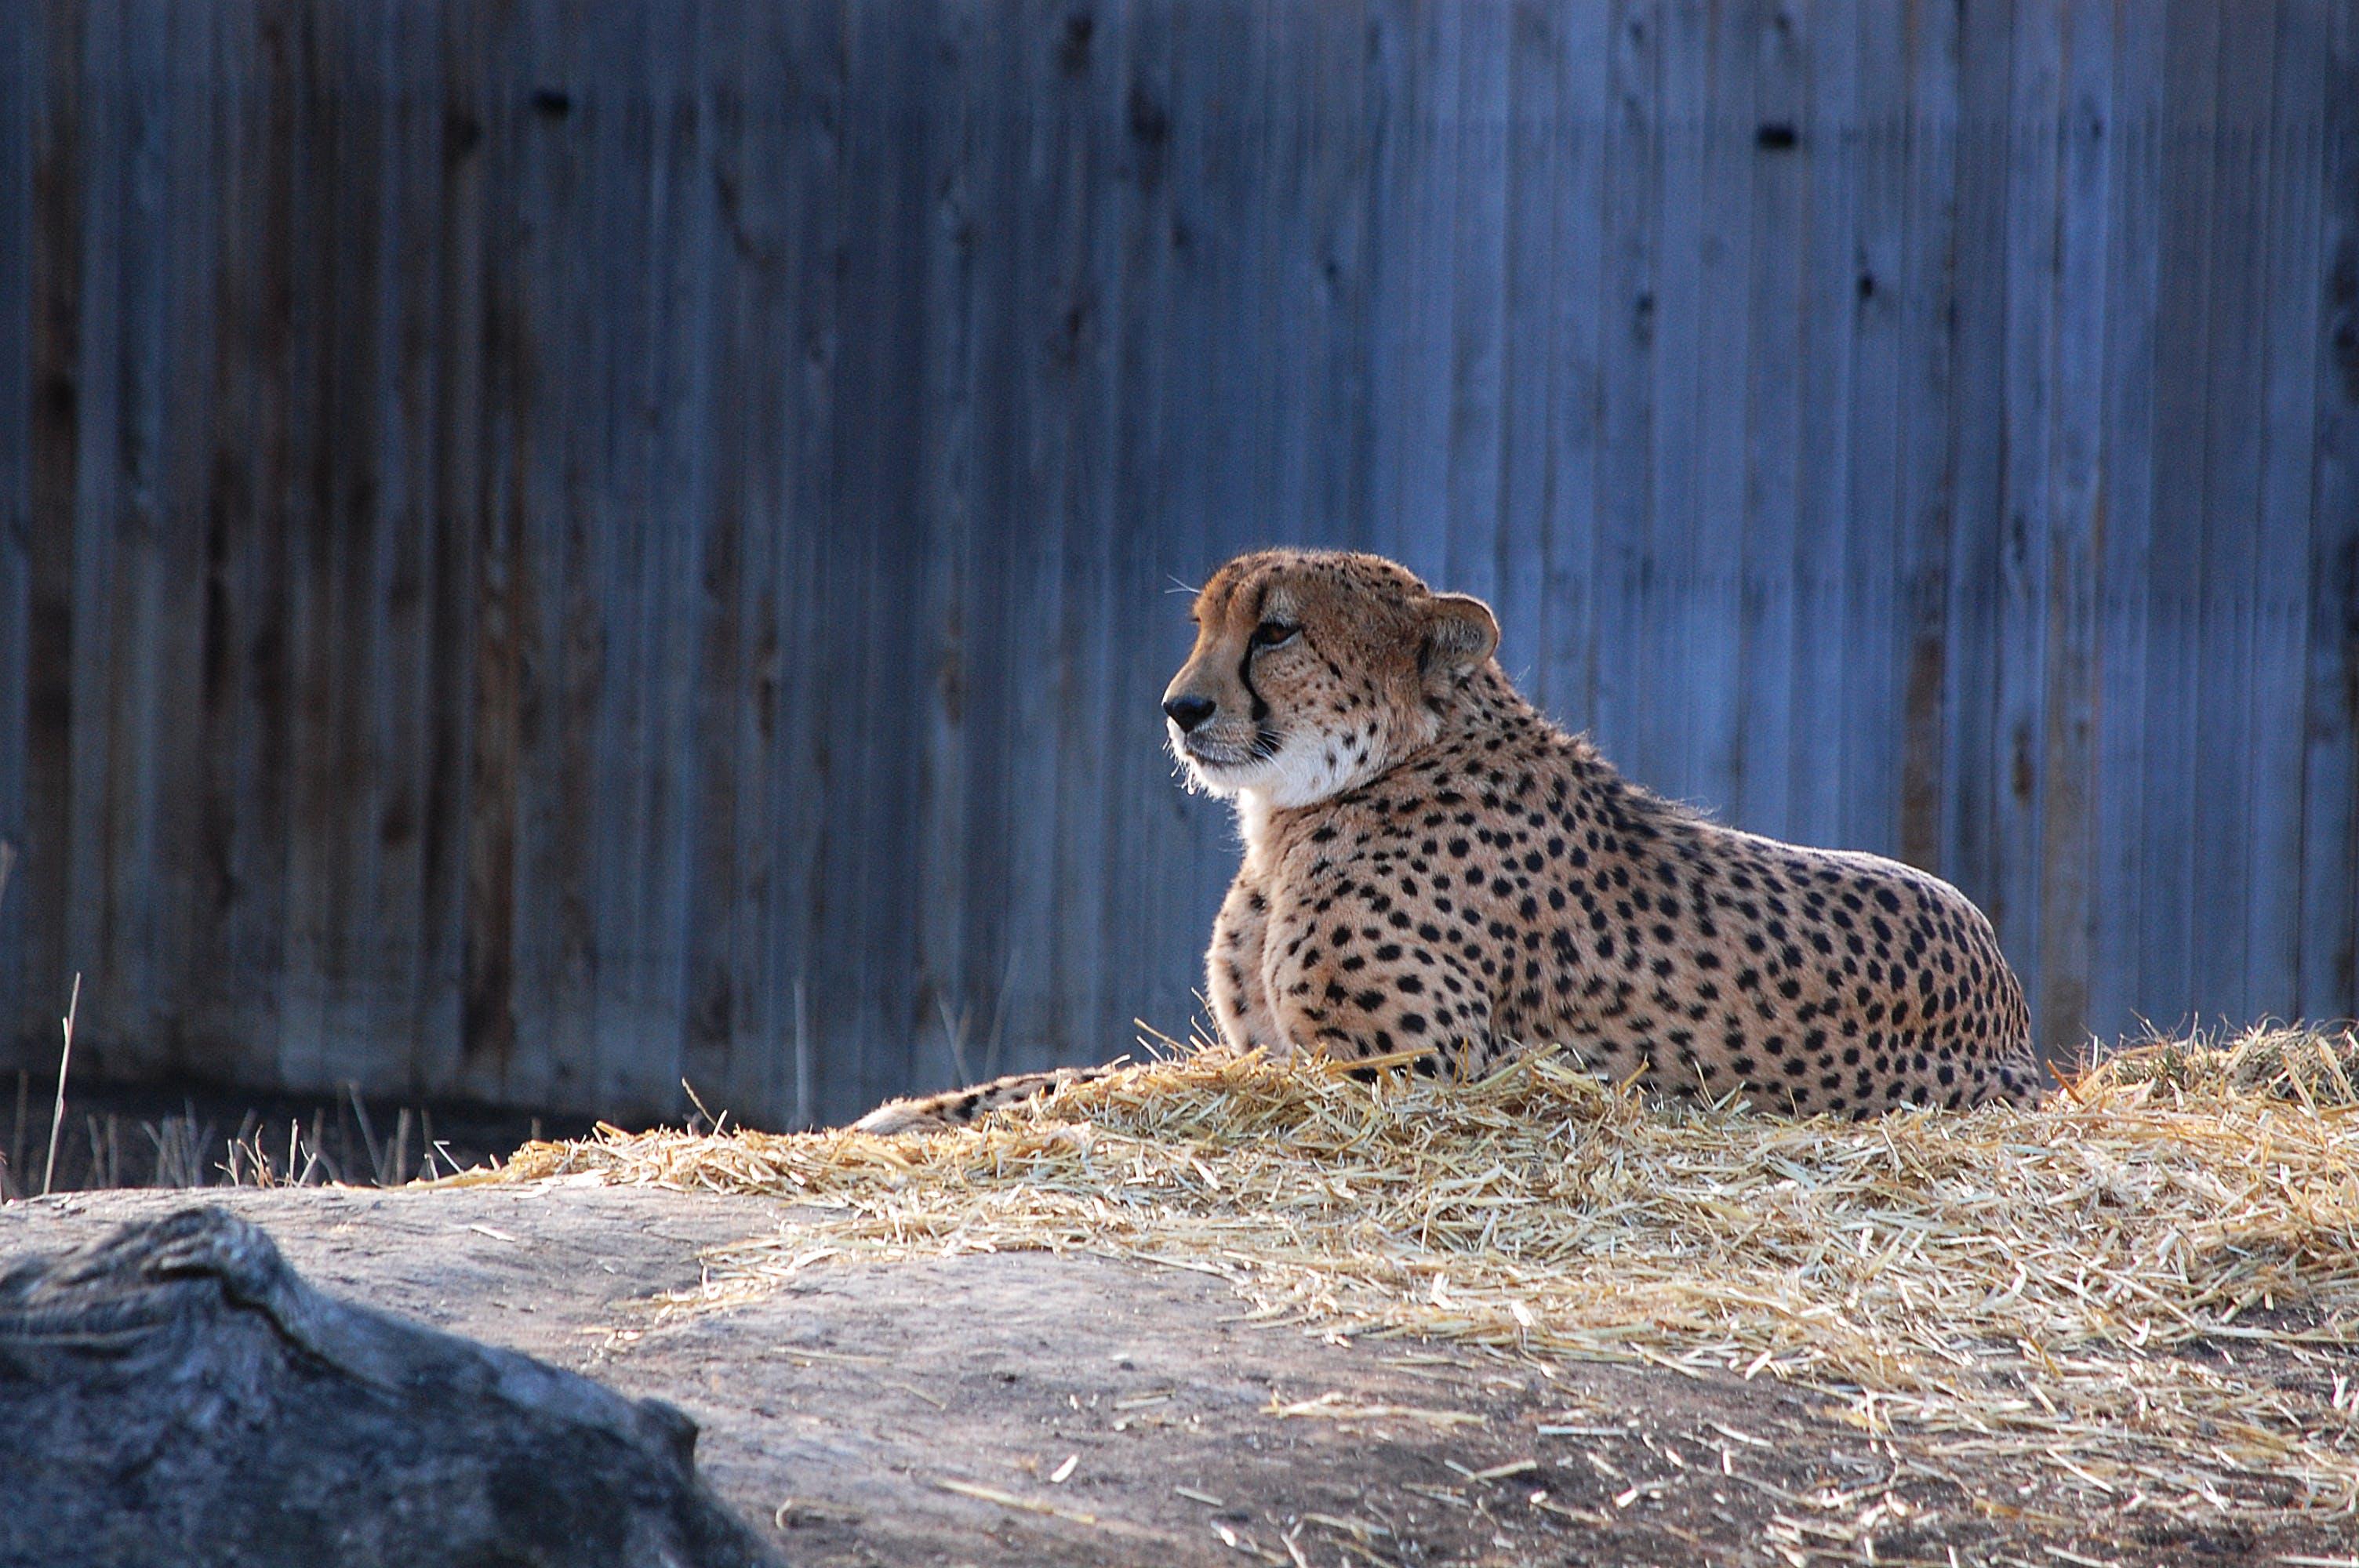 Kostenloses Stock Foto zu gepard, leopard, raubtier, safari